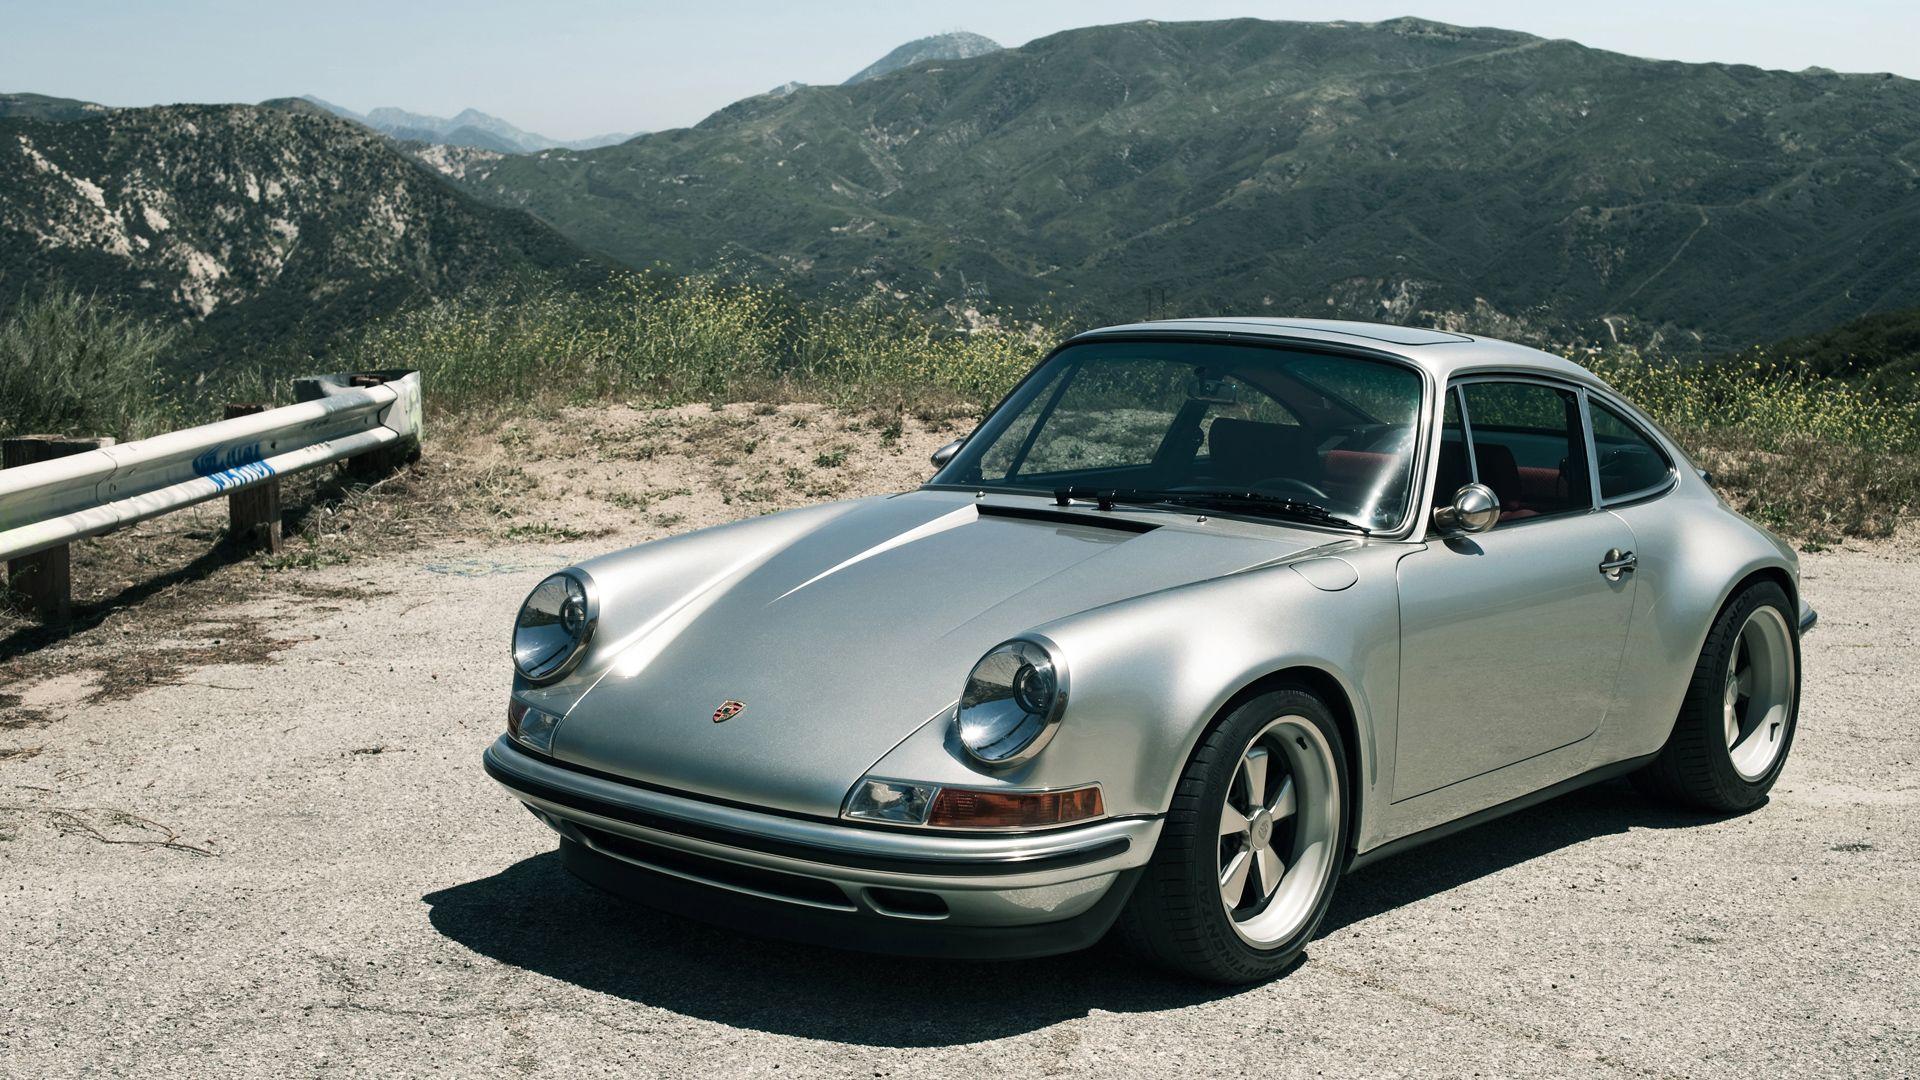 Classic Porsche Wallpapers   Top Classic Porsche Backgrounds 1920x1080